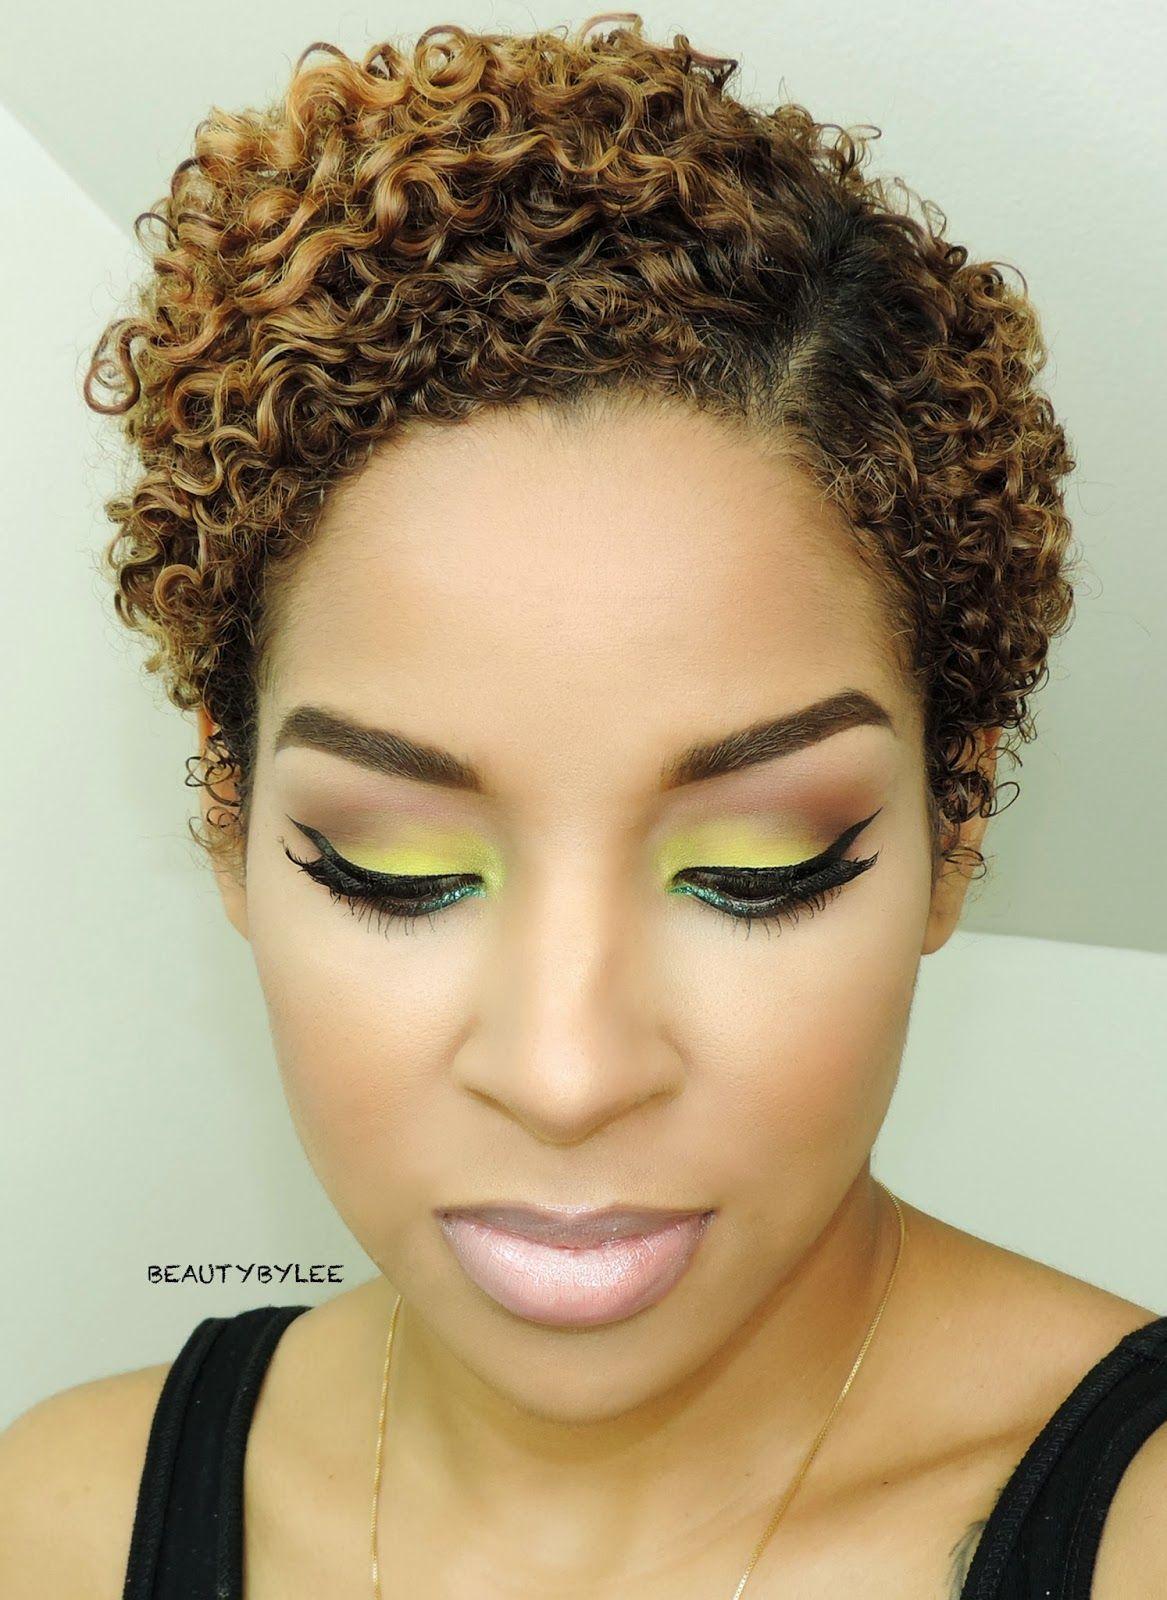 Beauty By Lee Get The Look Lavish Greens Trendy short